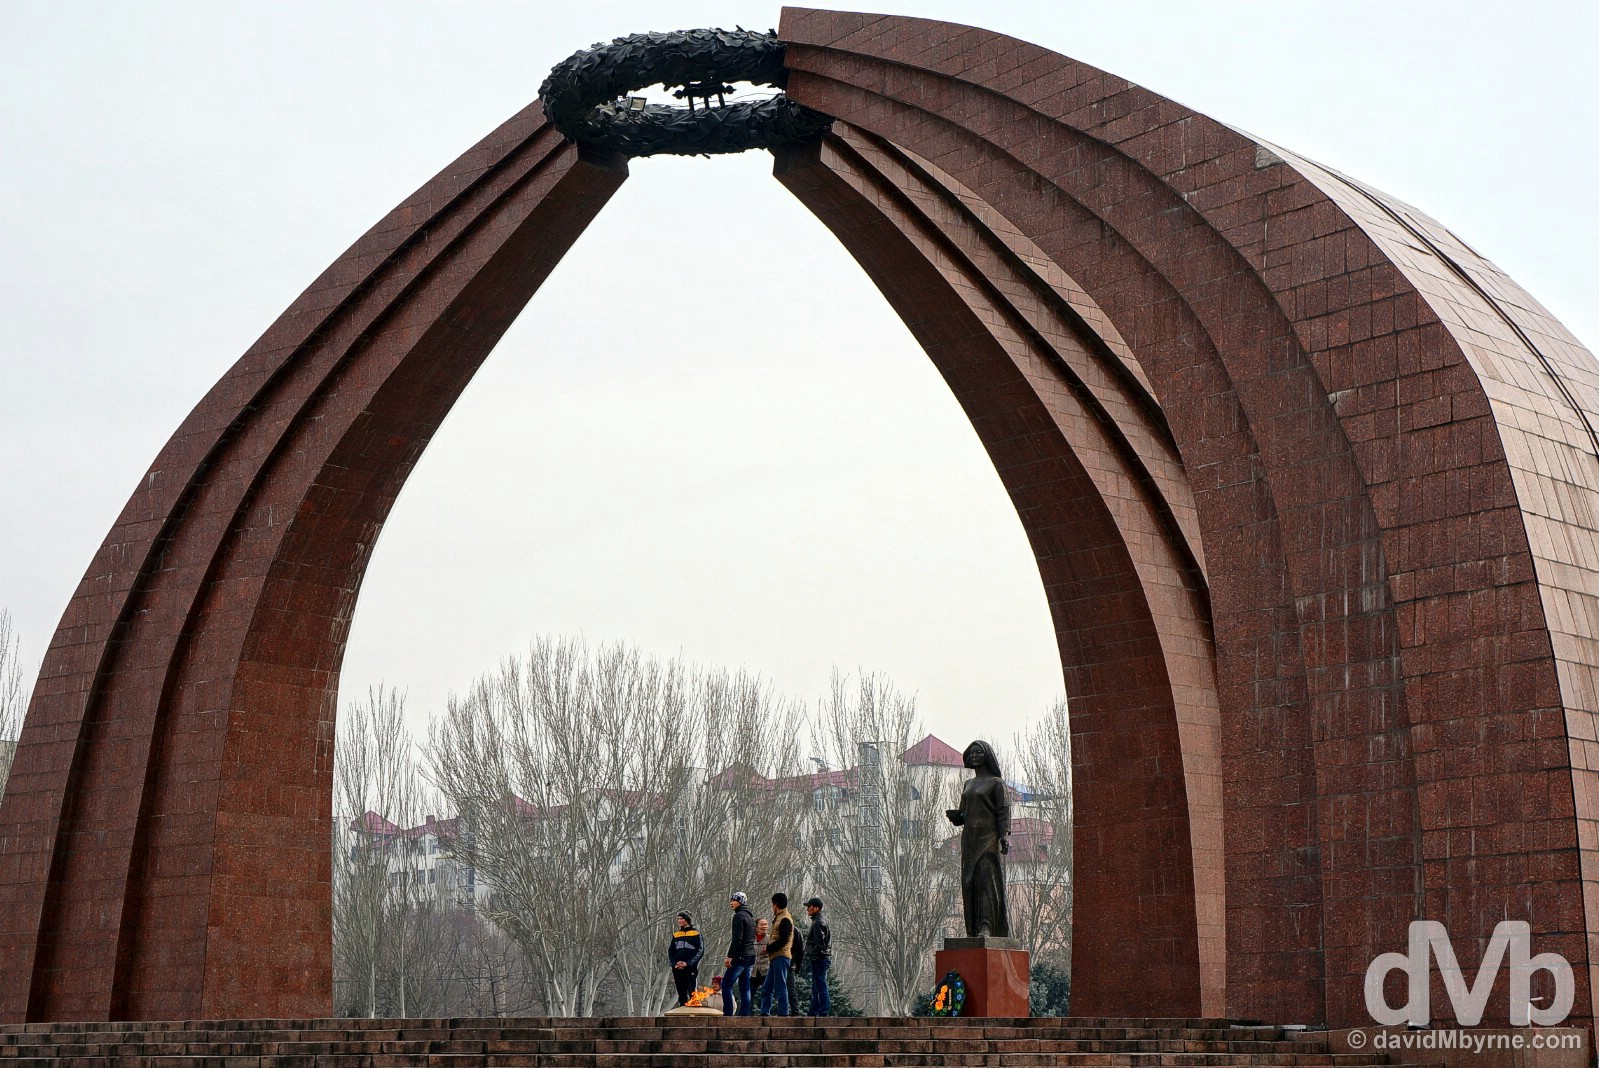 The War Memorial in Victory Square, Bishkek, Kyrgyzstan. February 23, 2015.